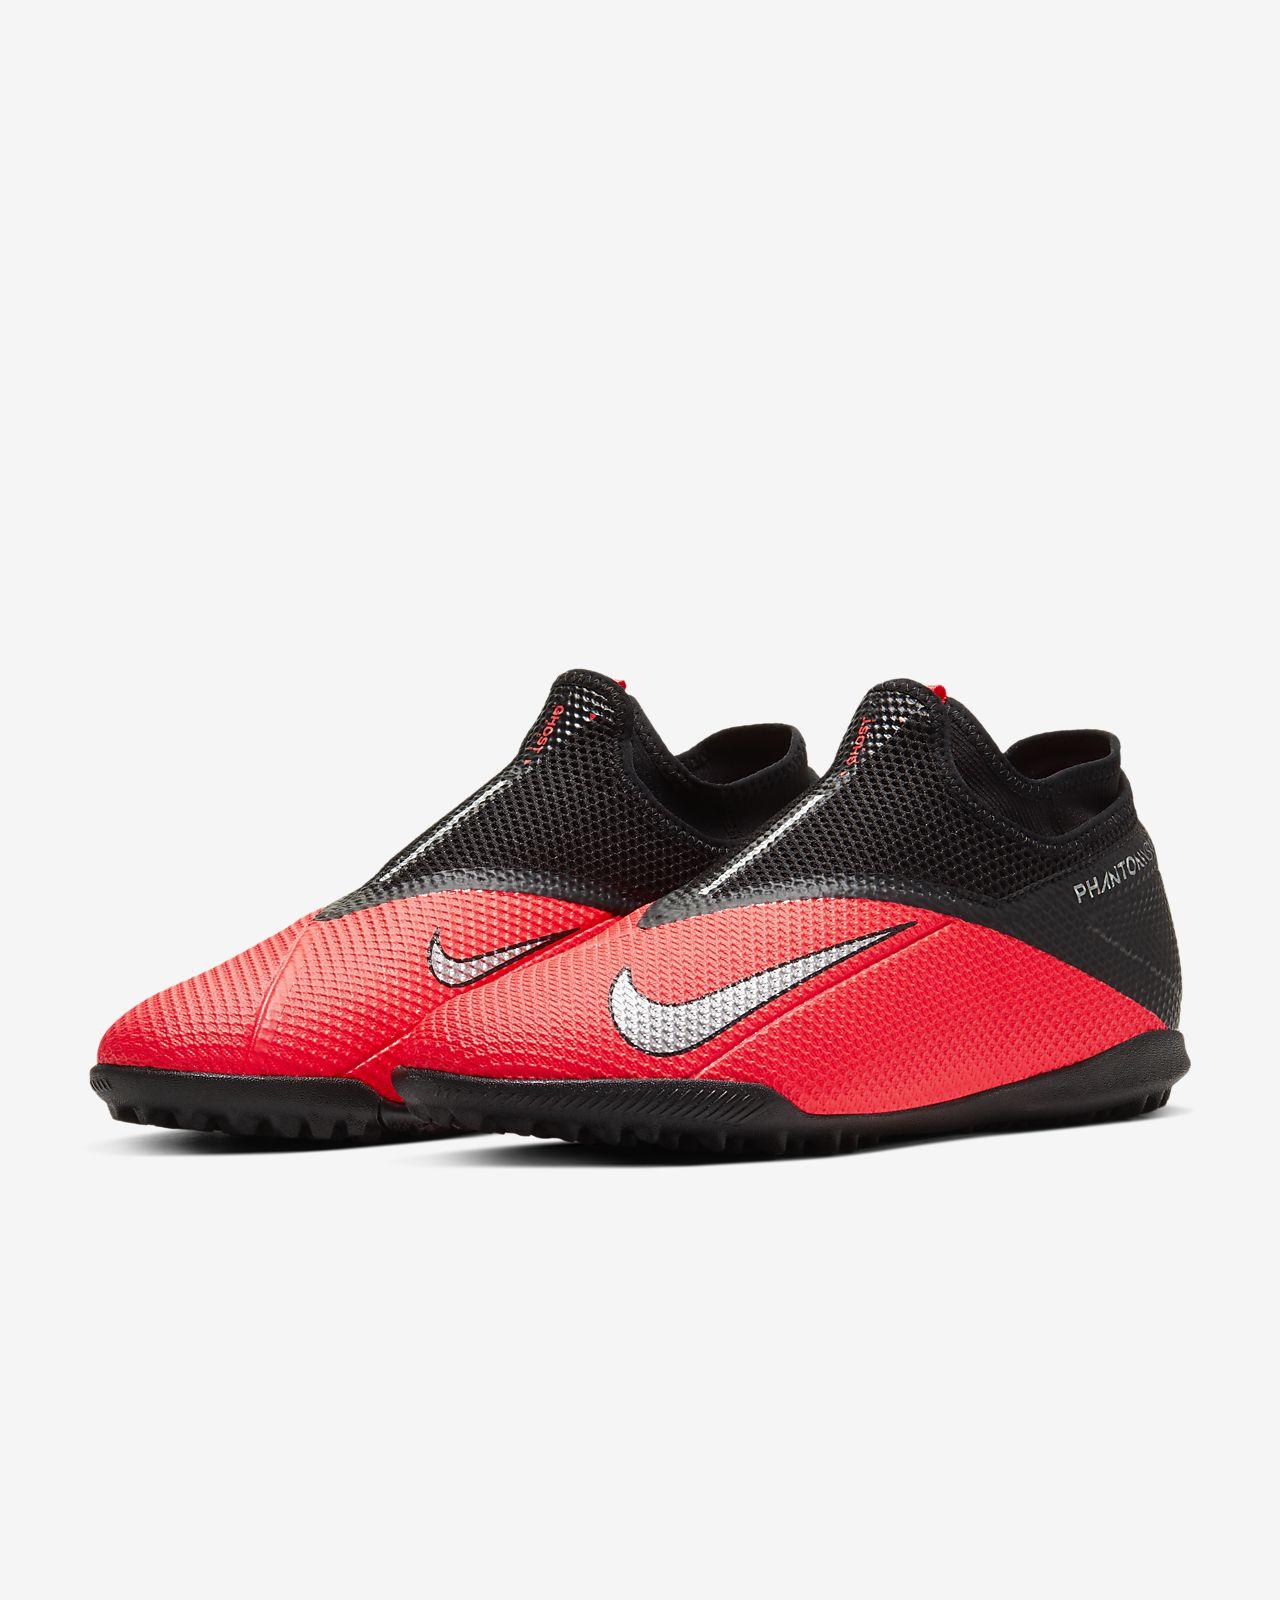 Nike Phantom Vision 2 Academy Dynamic Fit TF Artificial Turf Football Shoe